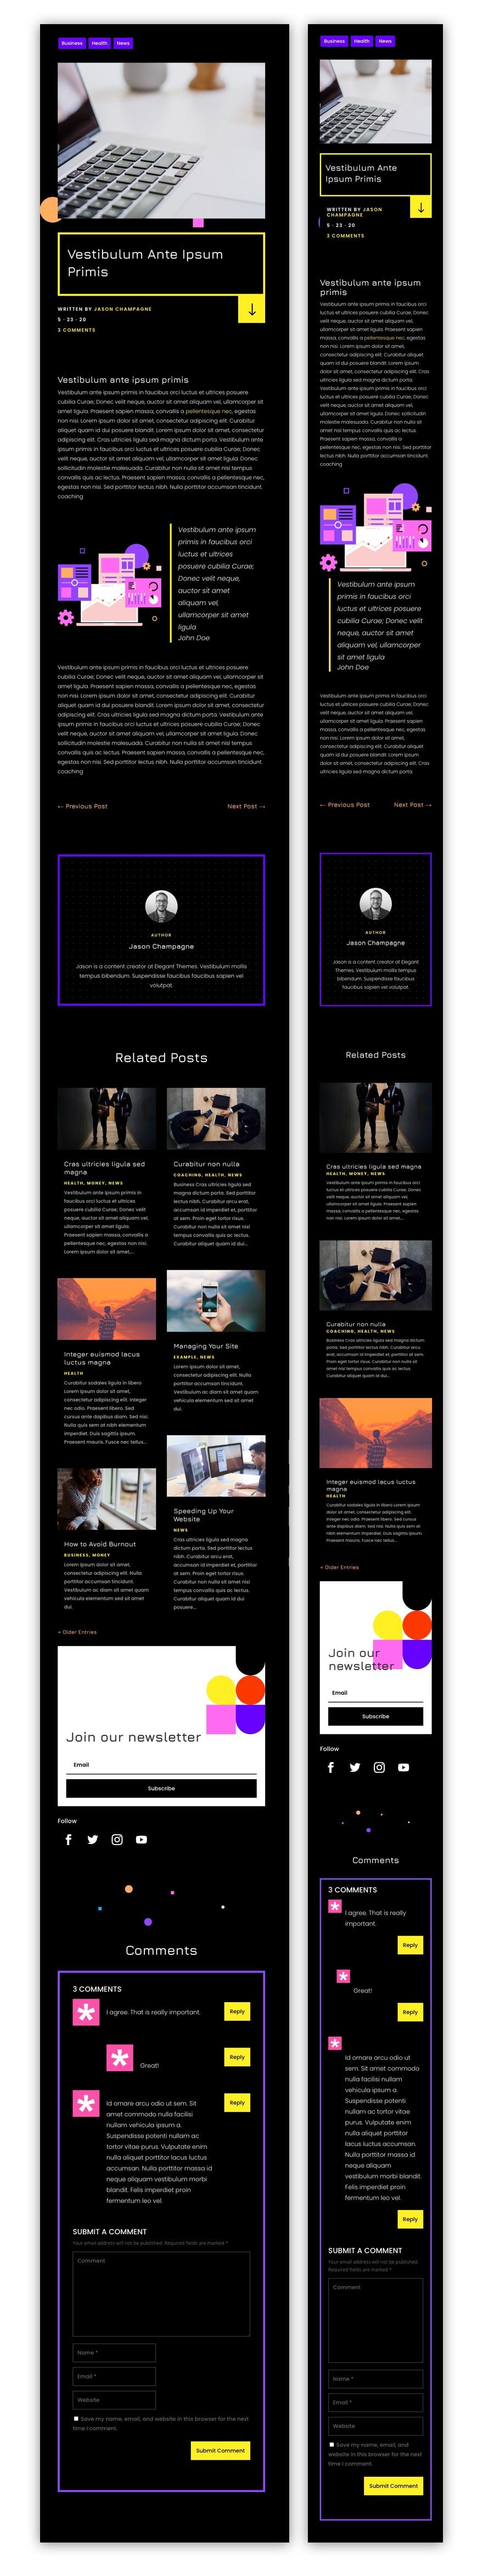 divi virtual conference blog post template